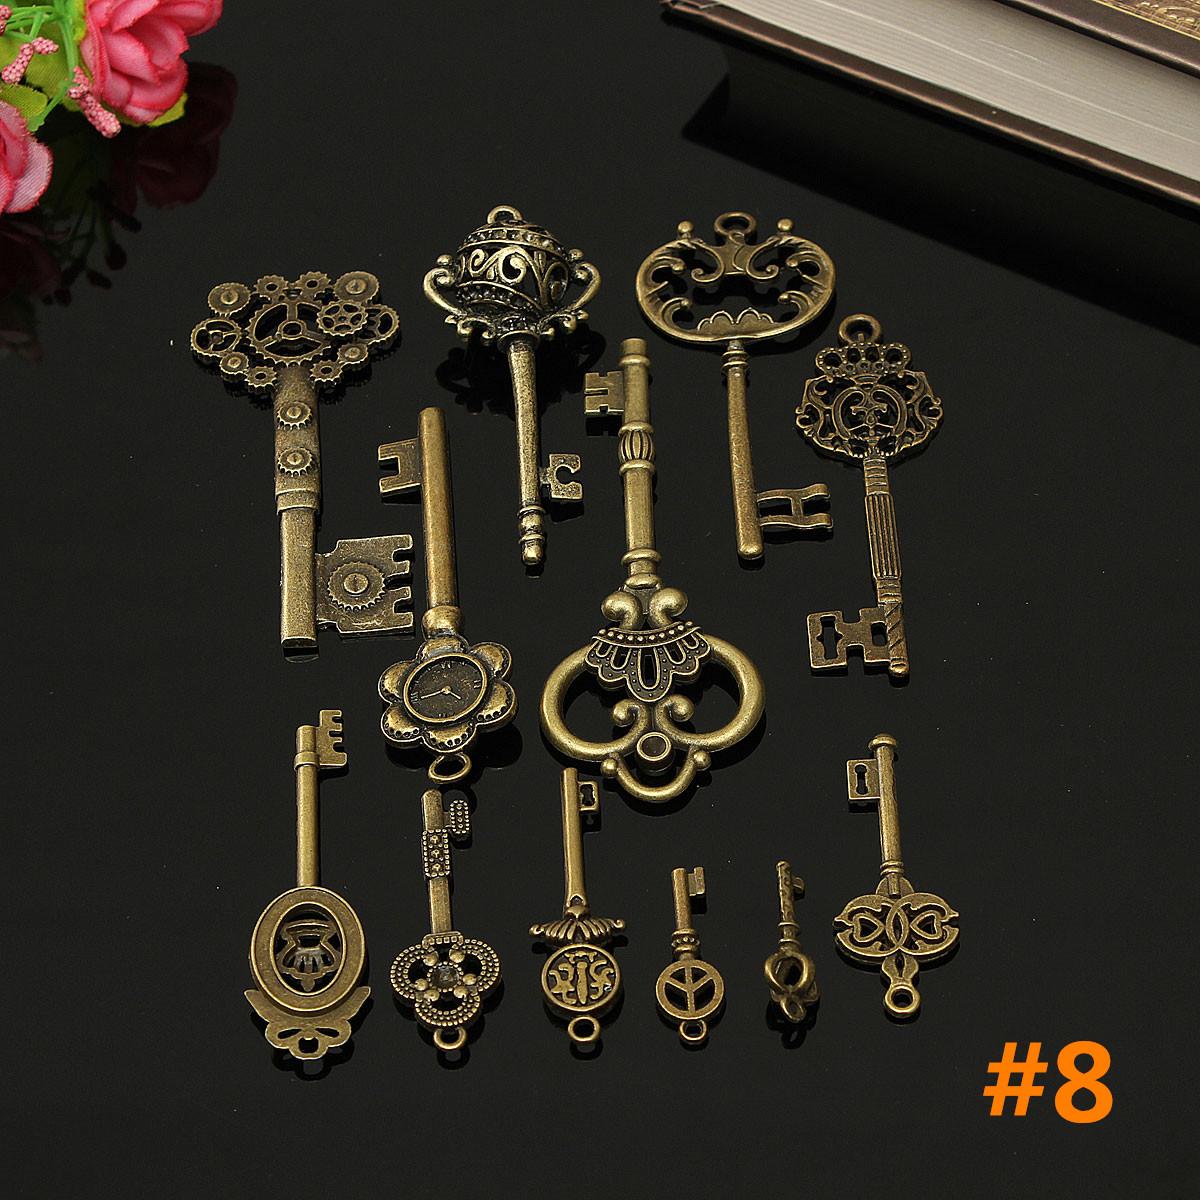 vintage style key set - photo #26